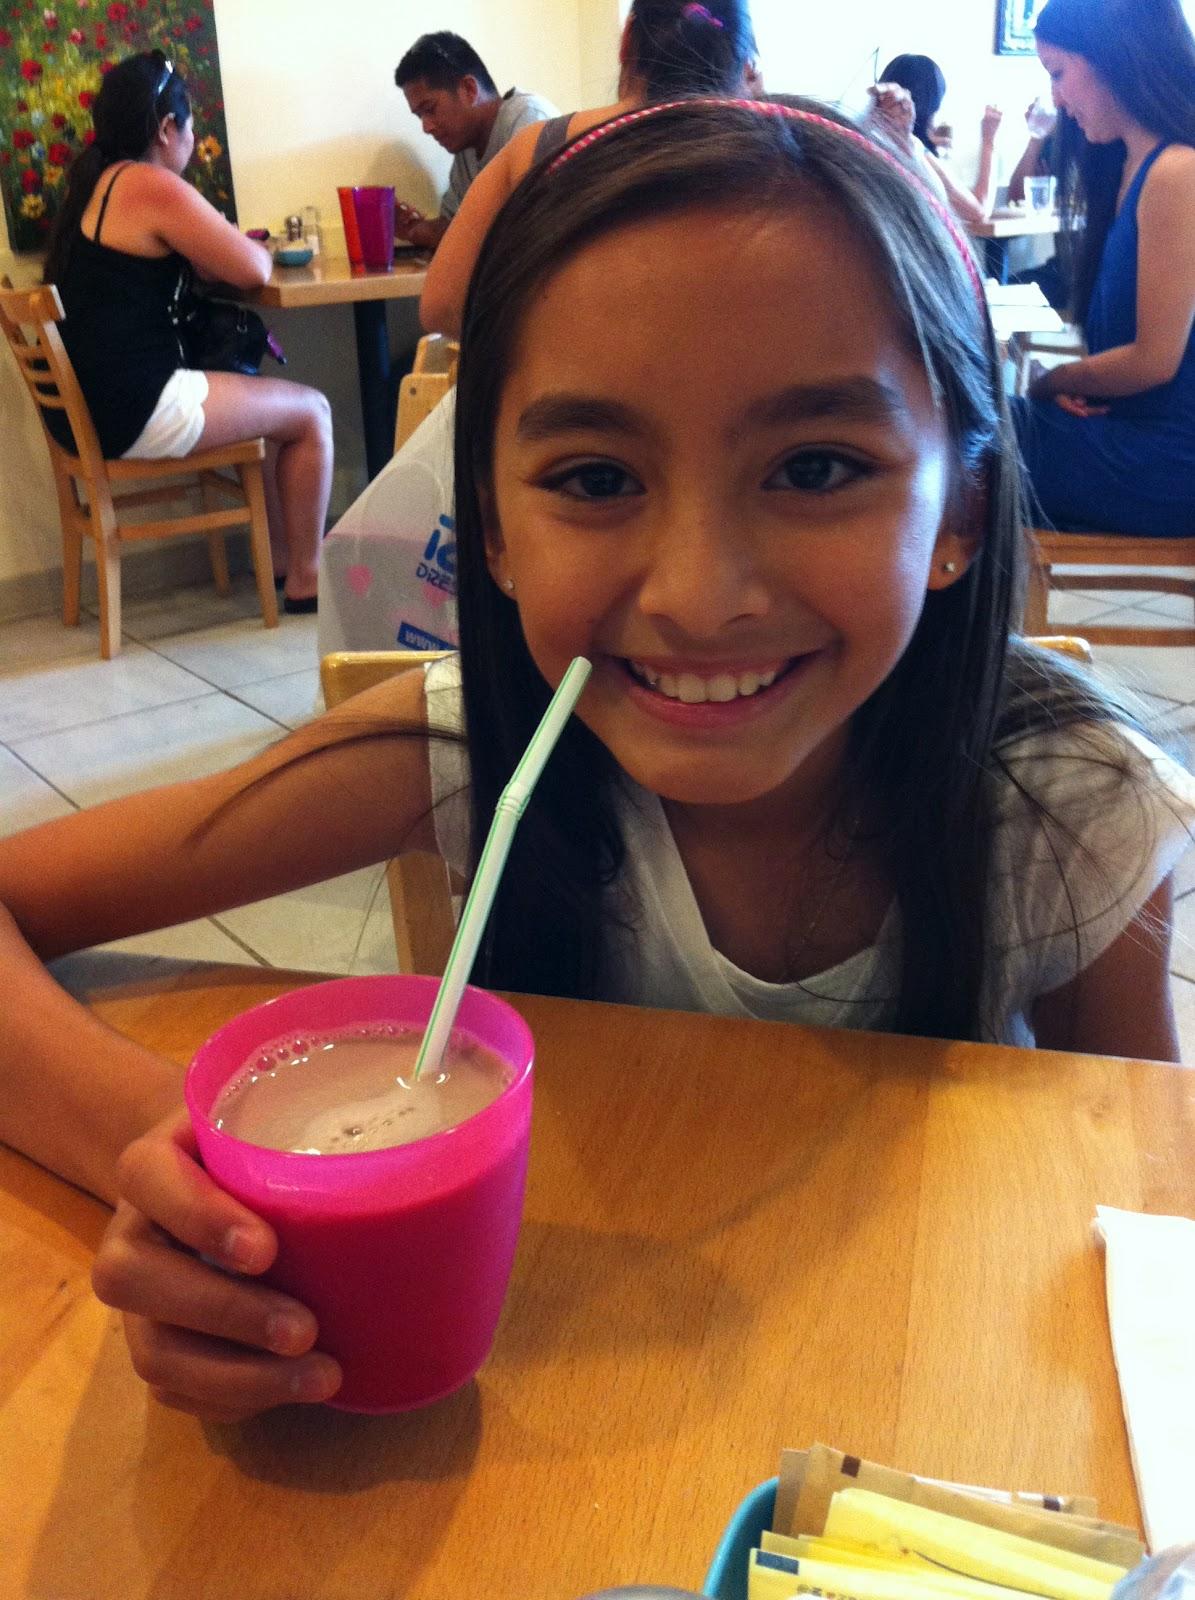 Tropical Cutie - Deli CHOCOLATE MILK WAS VERY SMALL